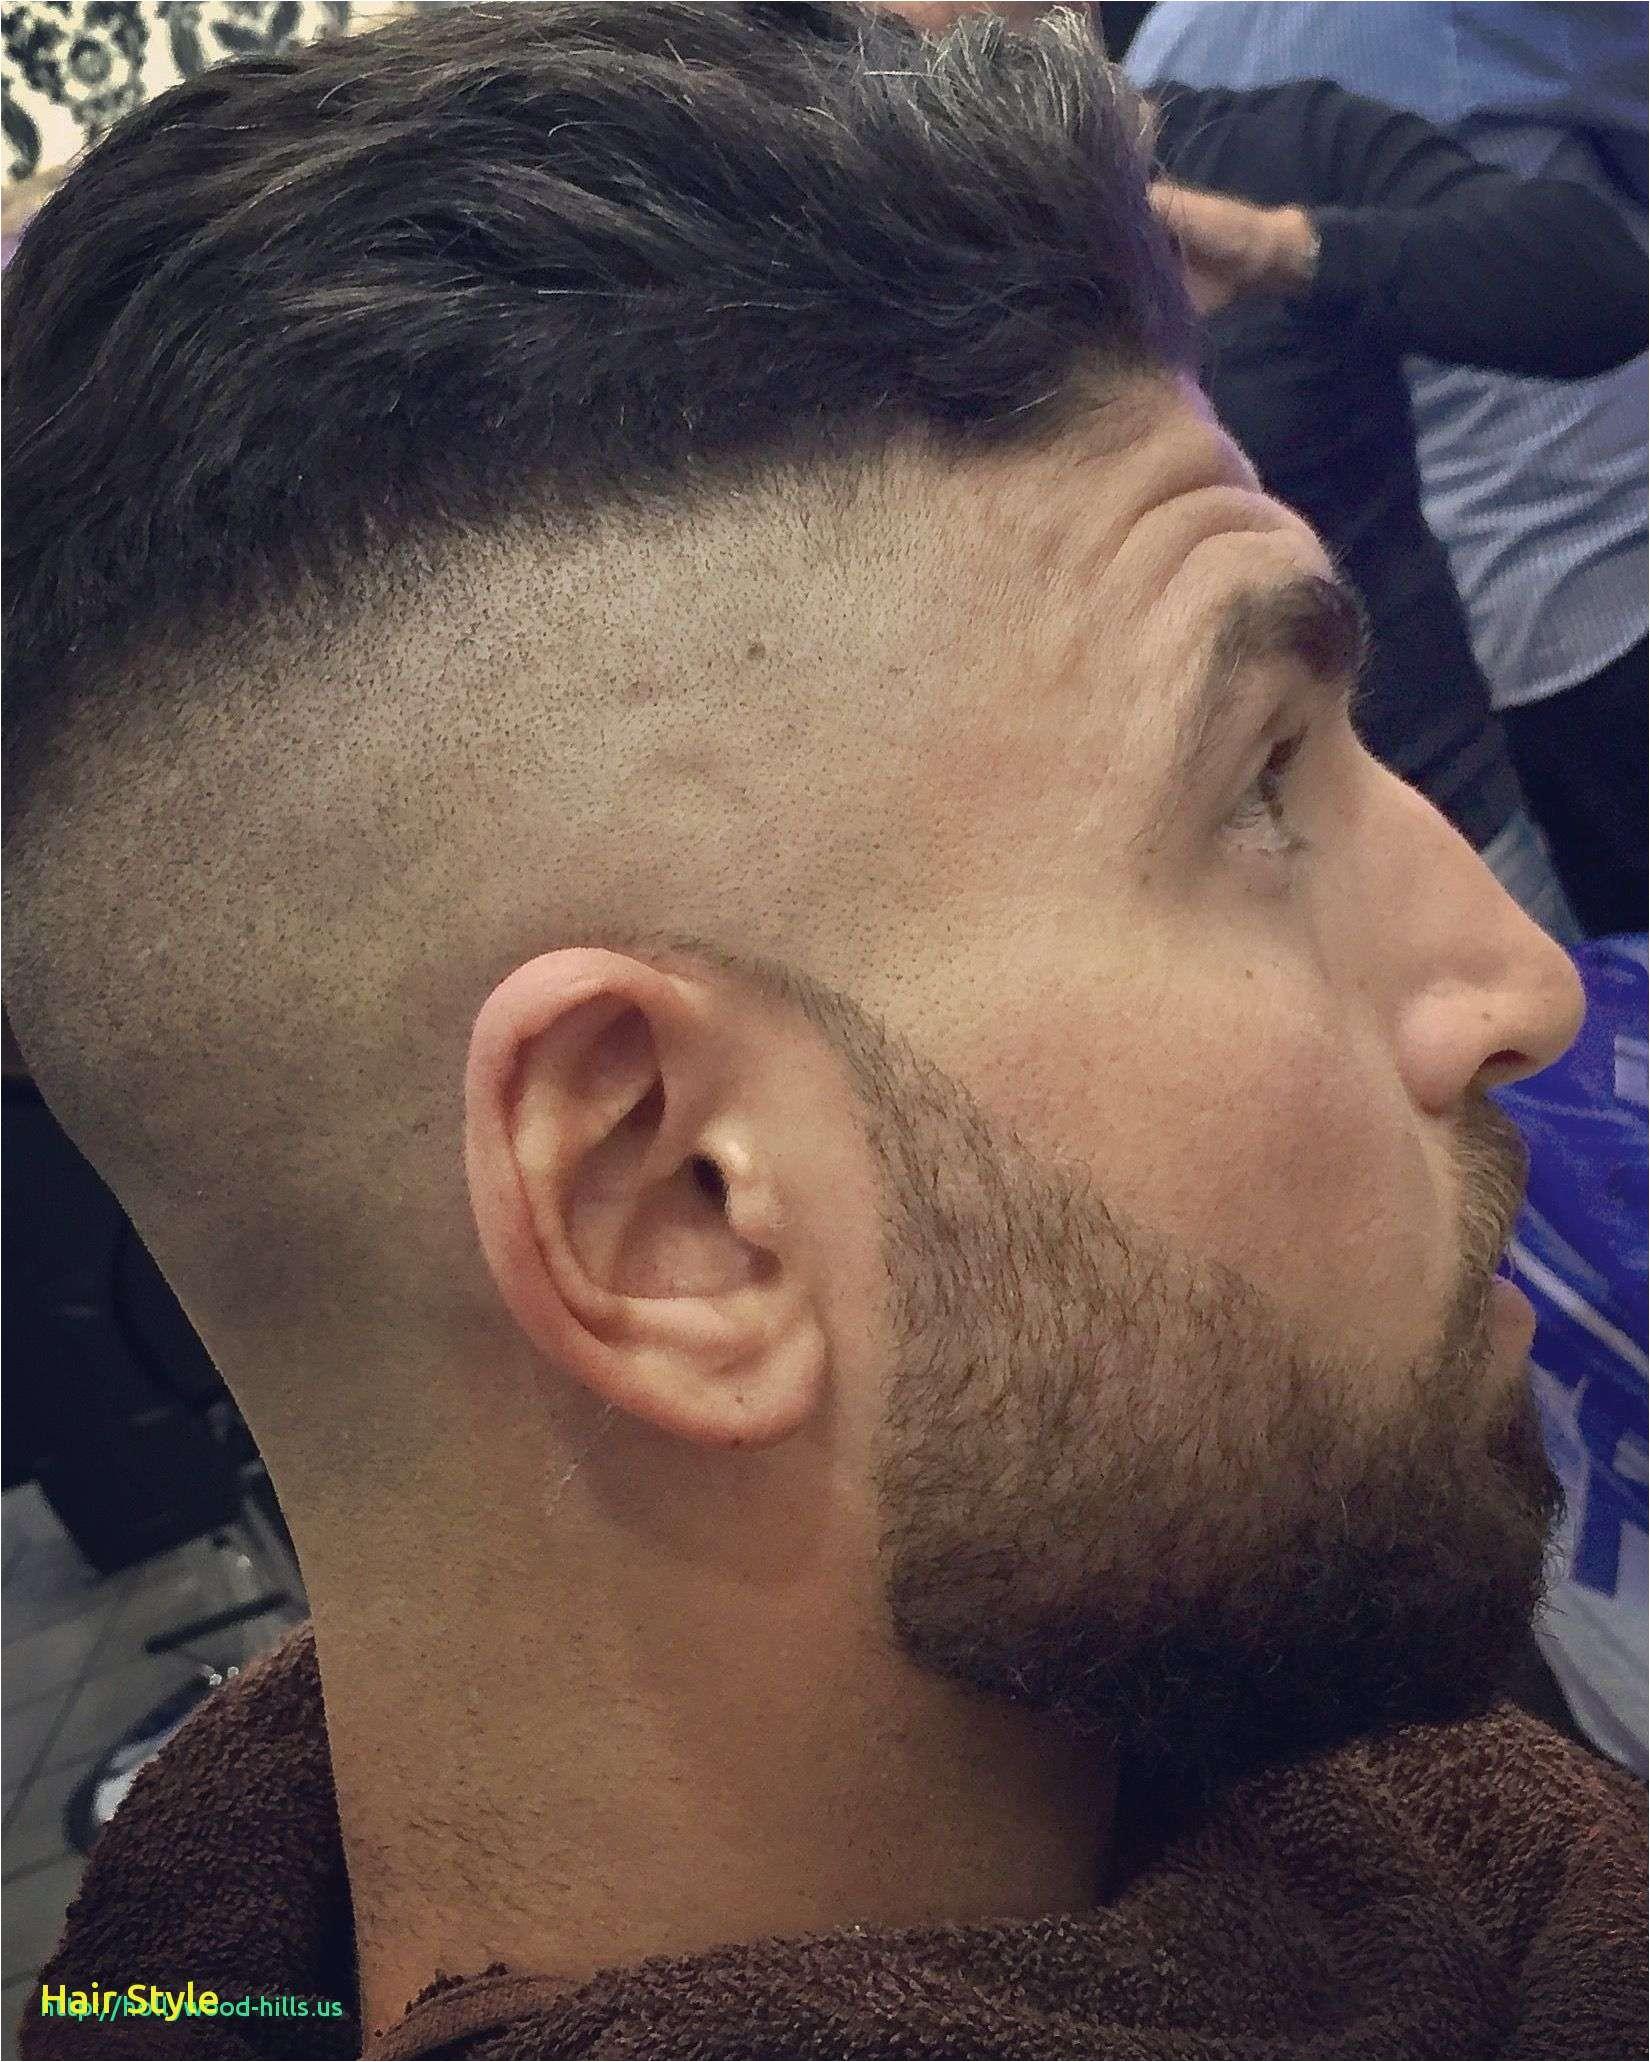 new haircut style for man elegant gym hairstyles male new hairstyles for men luxury haircuts 0d